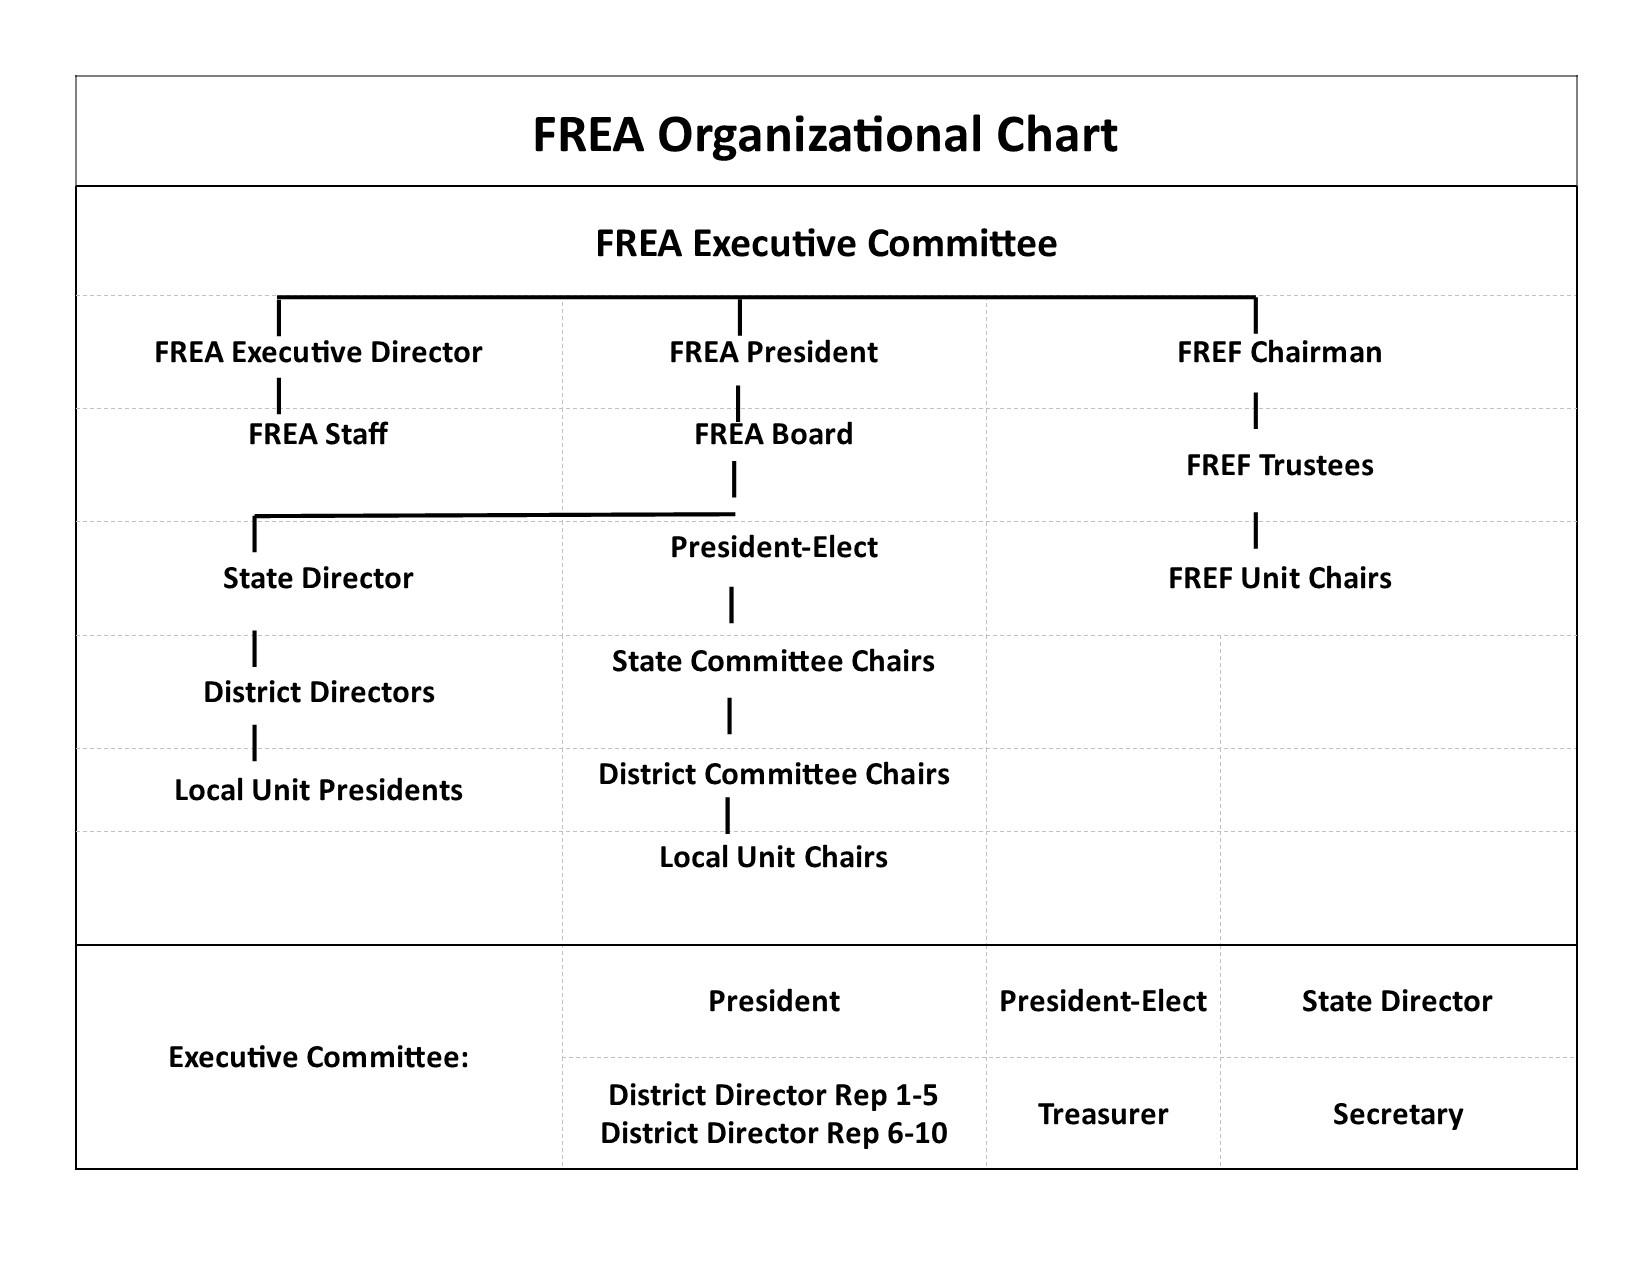 FREA Organizational chart 2021